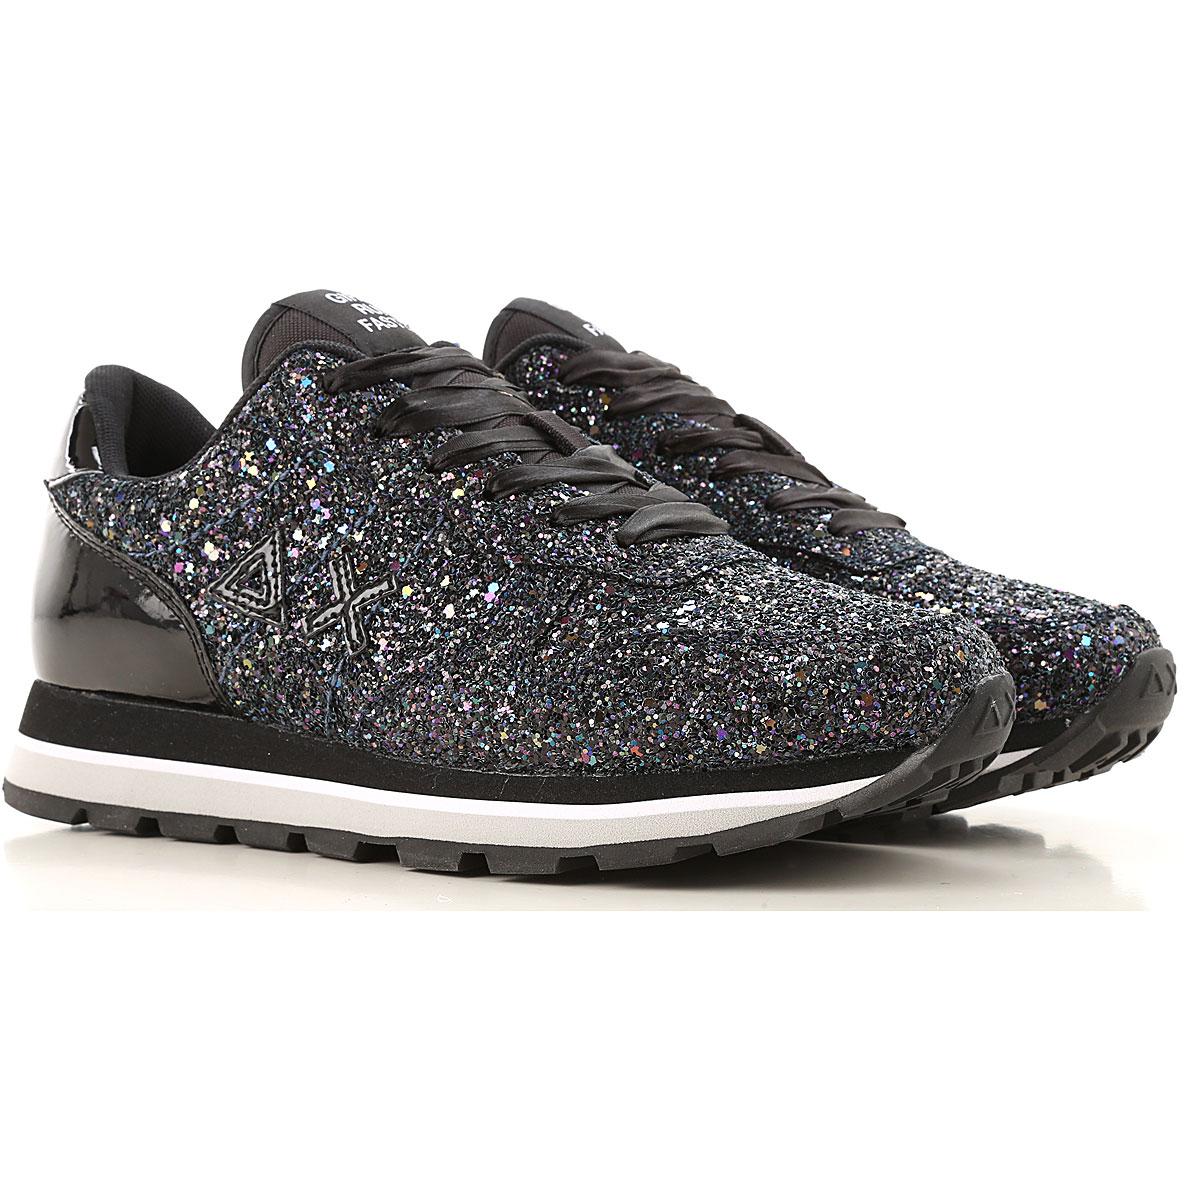 Sun68 Sneakers for Women On Sale, Black, Fabric, 2019, 5 7 9